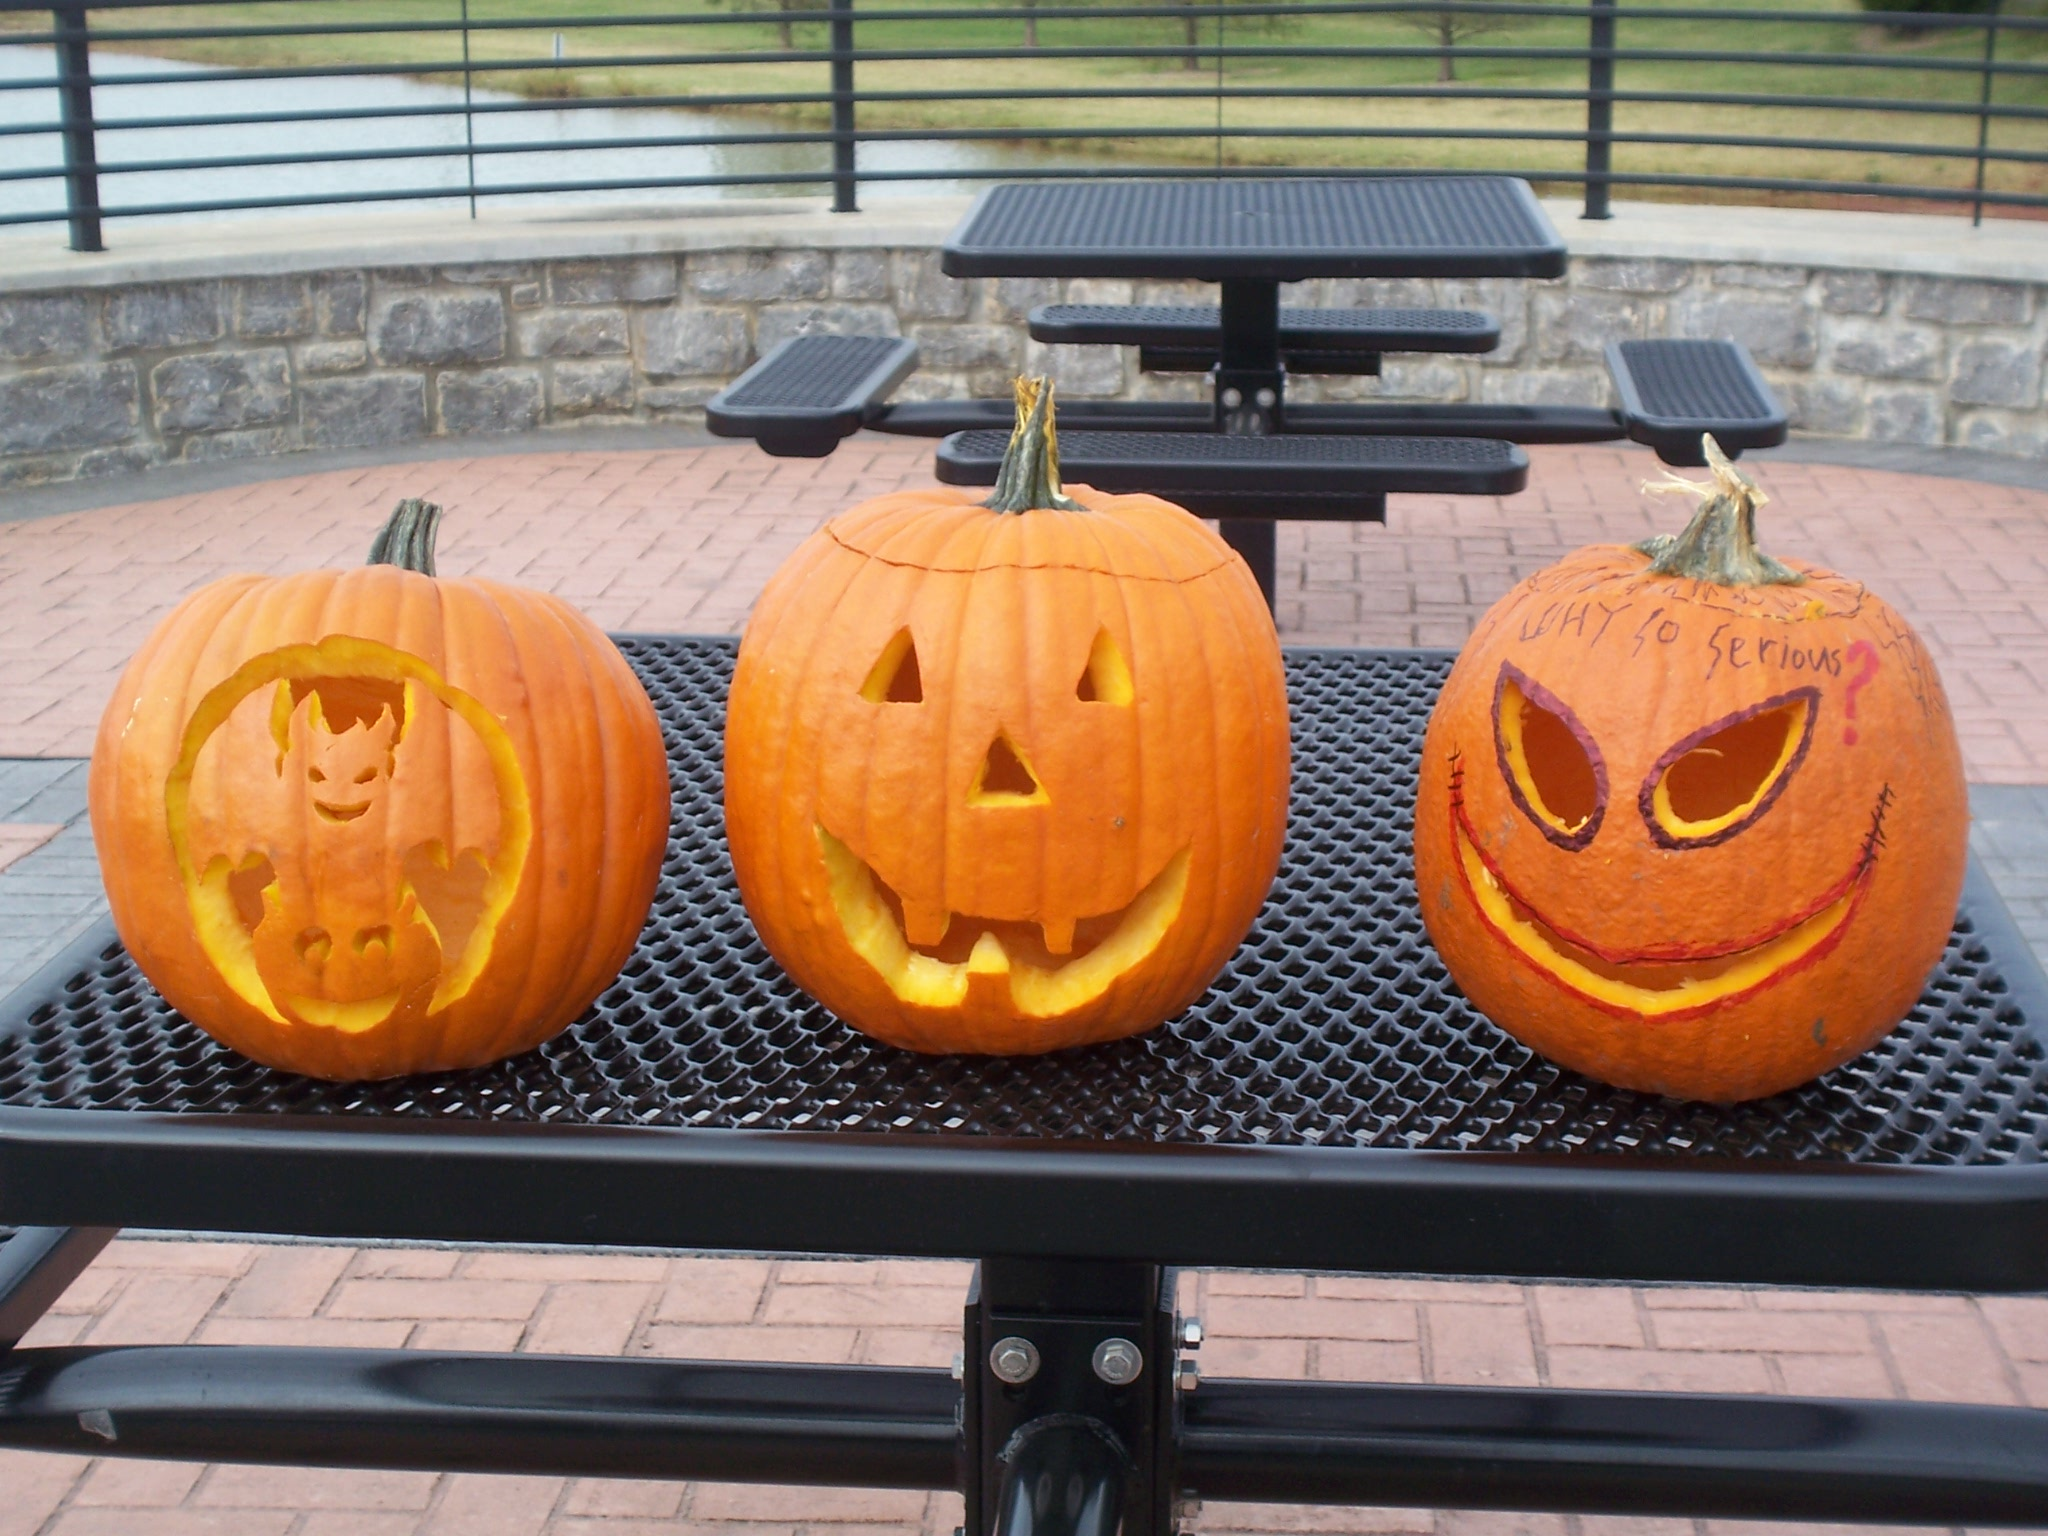 Halloween 2012 Pumpkin Carving contest